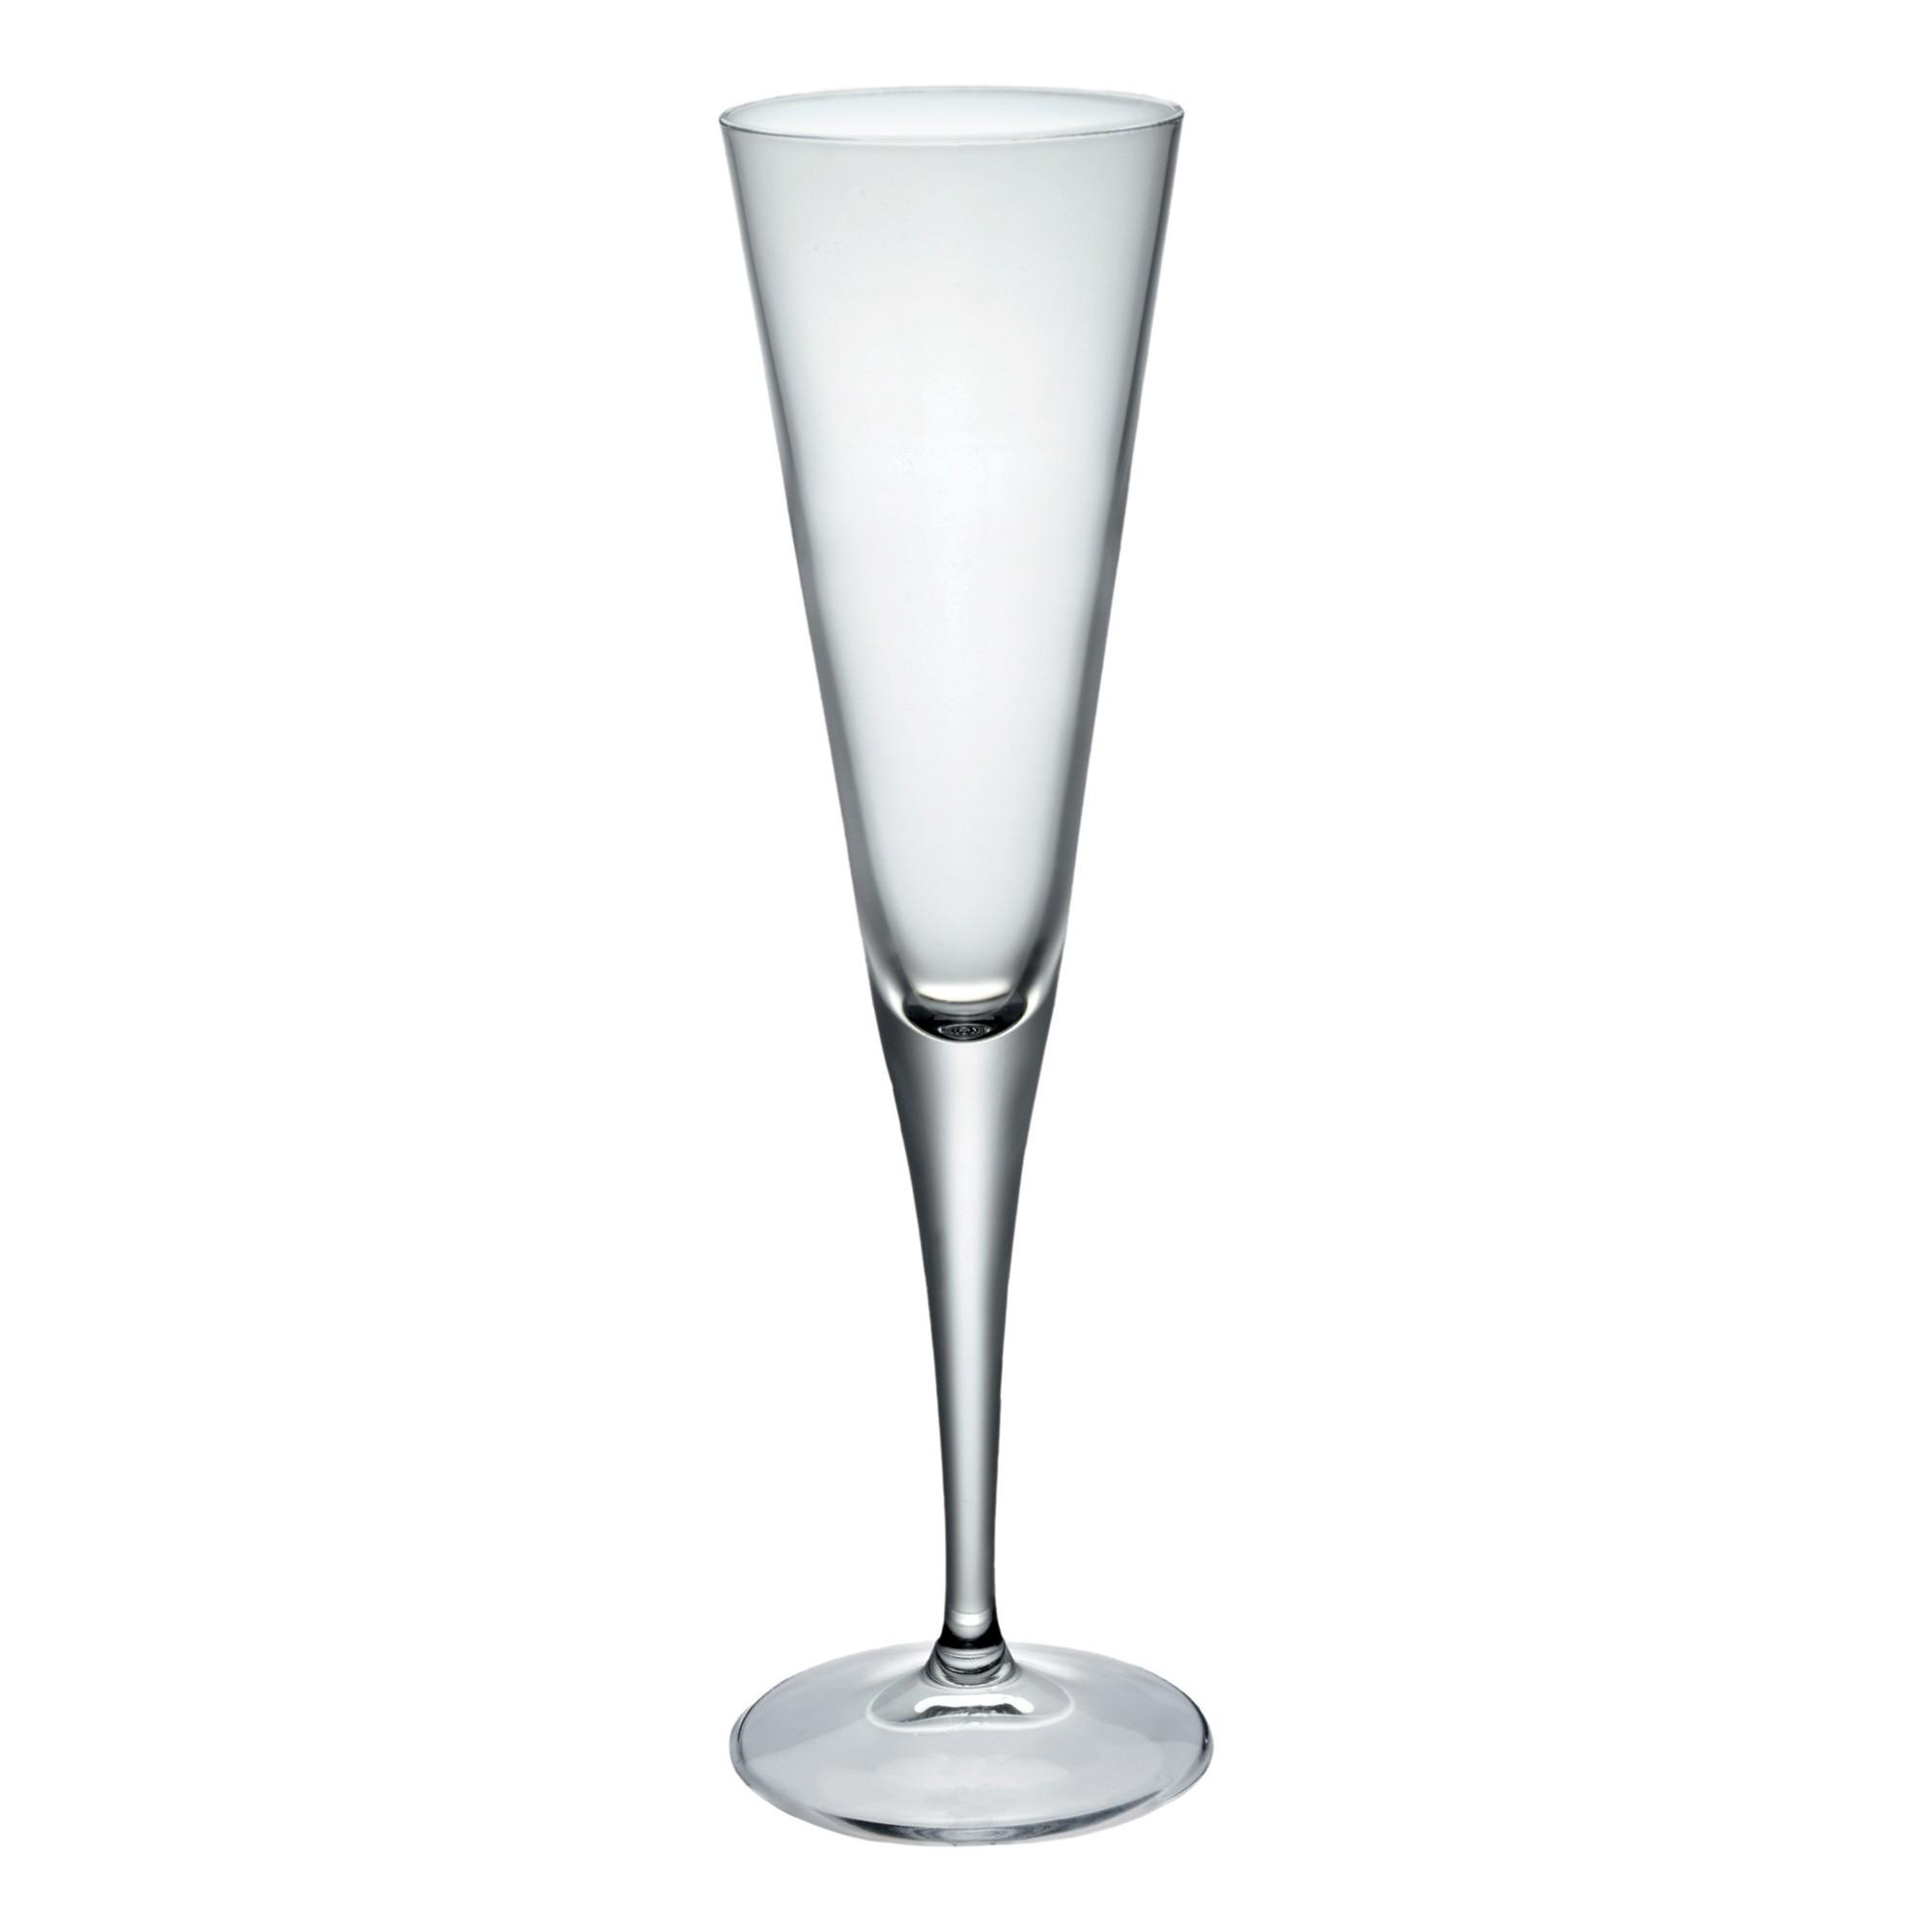 Bormioli Rocco Ypsilon Champagne Flutes, Set of 4